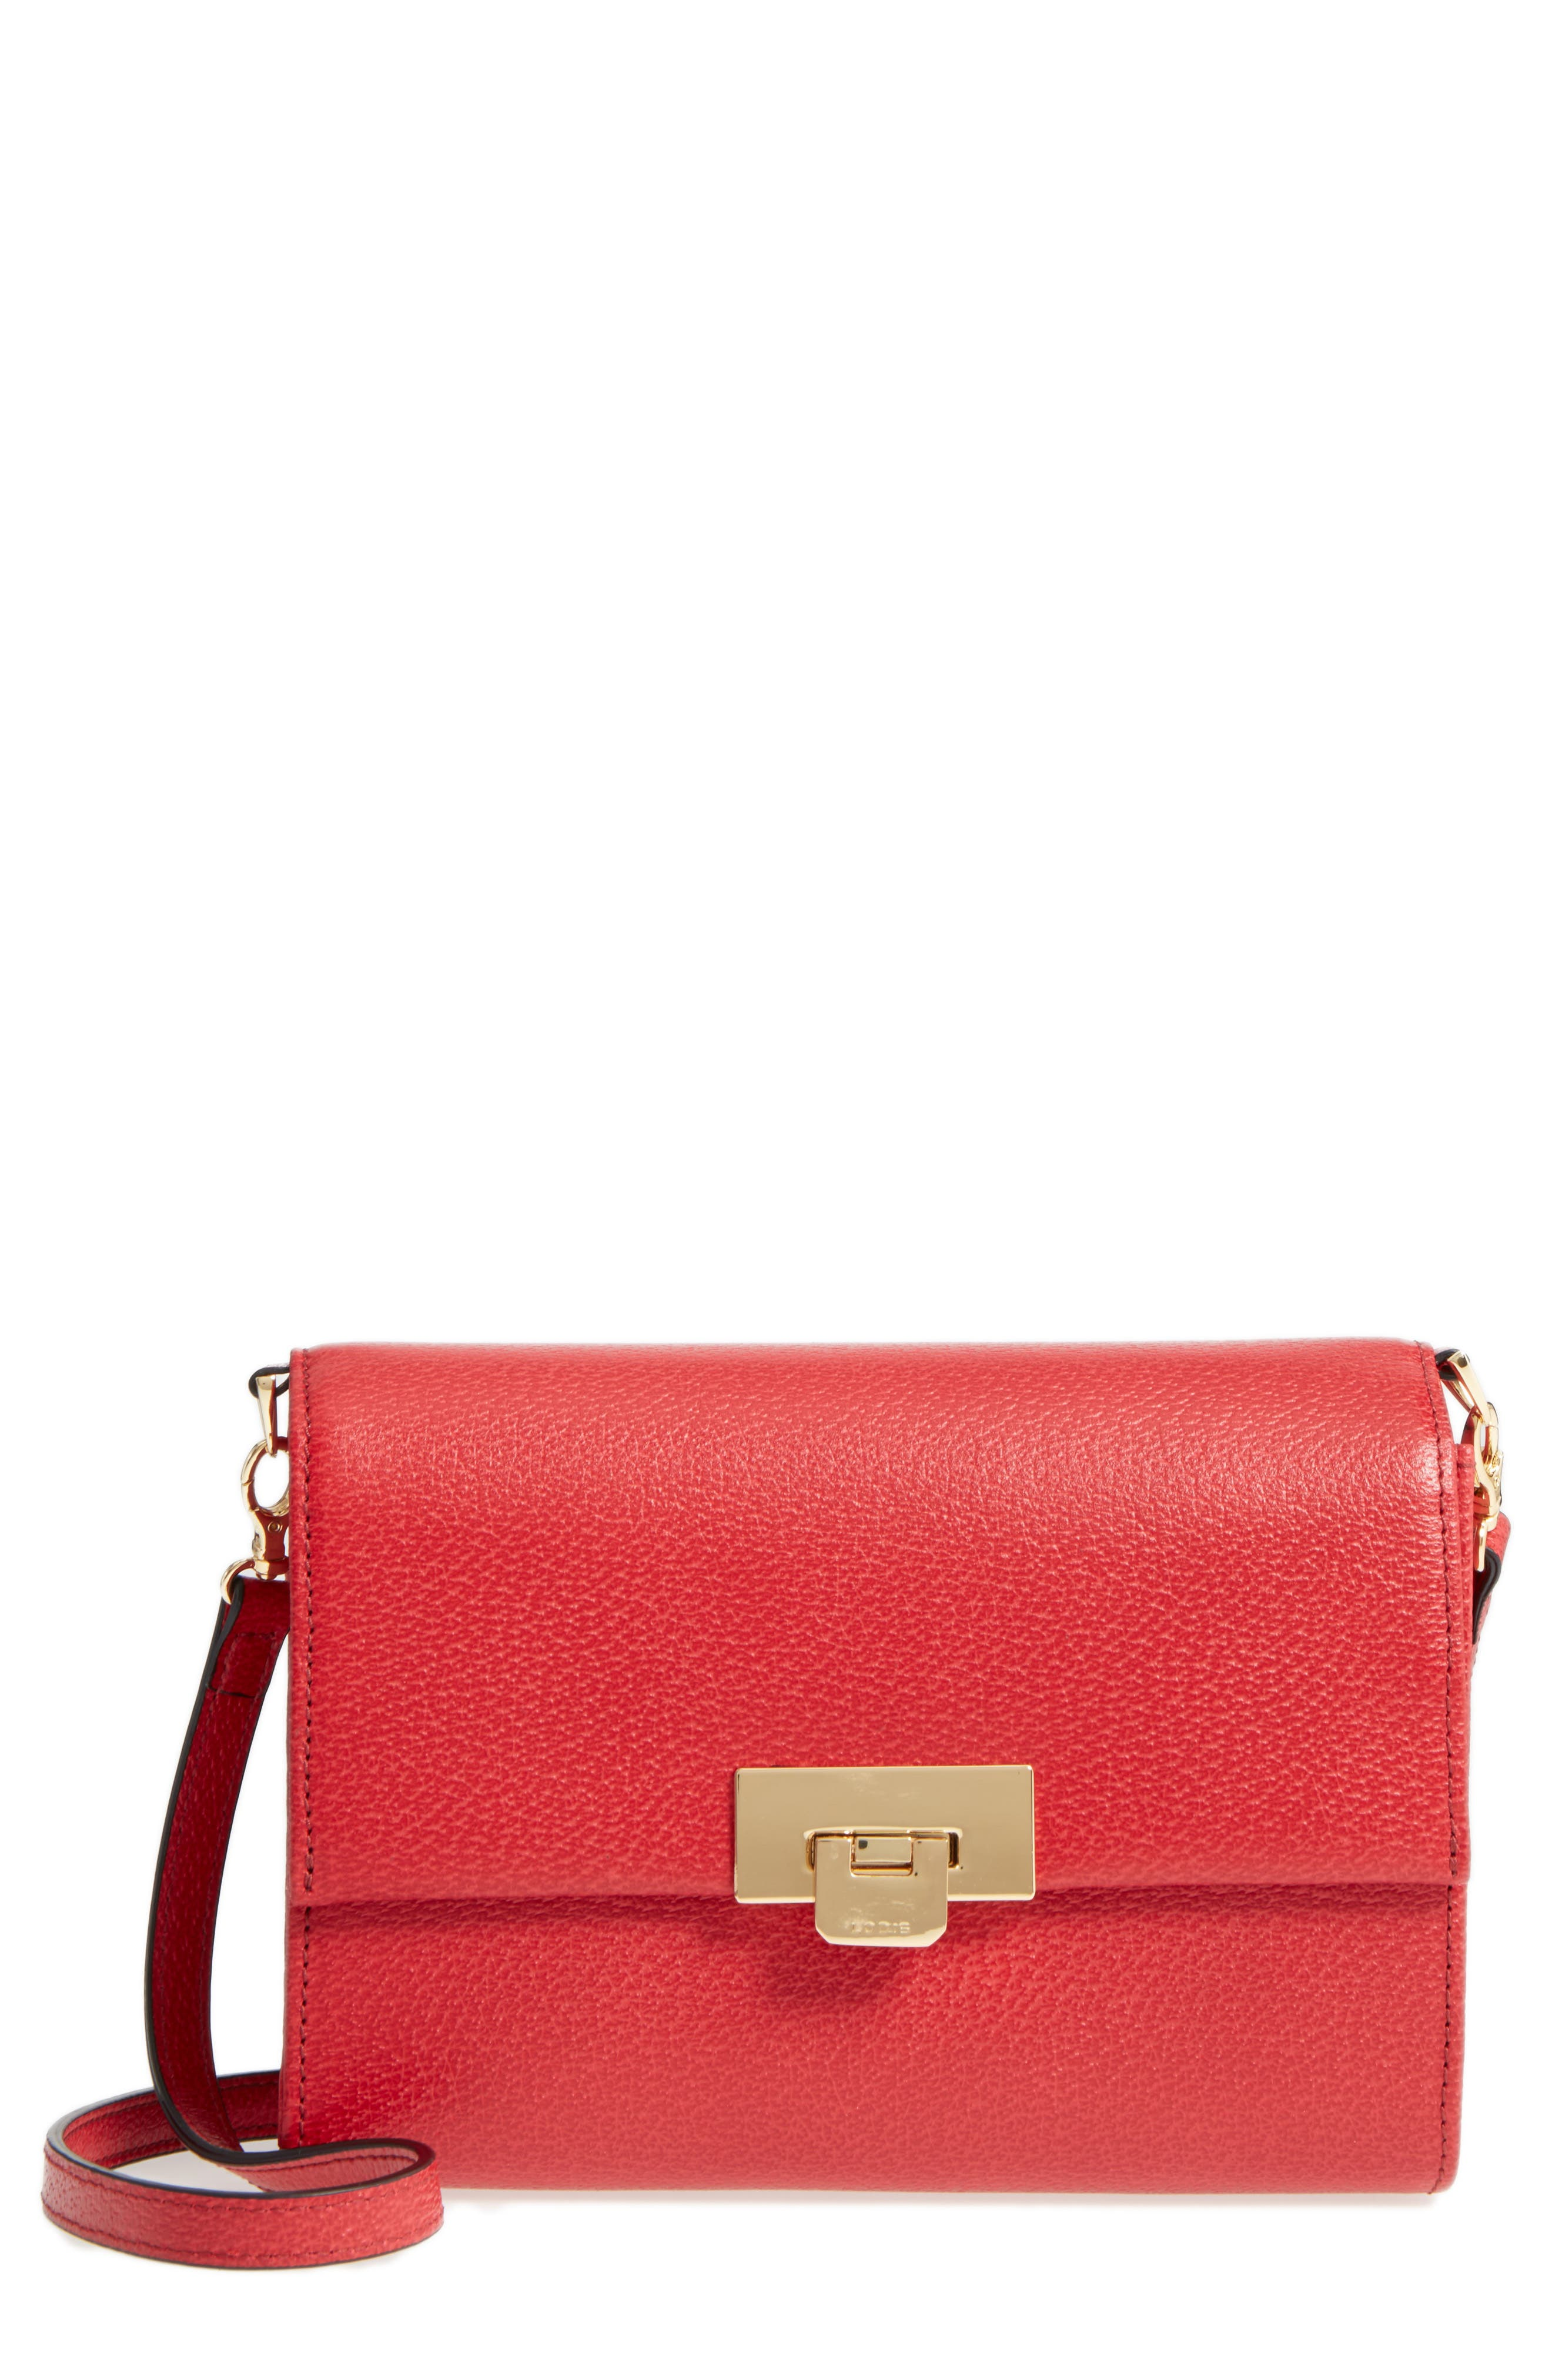 Lodis Stephanie Under Lock & Key - Small Eden Leather Crossbody Bag